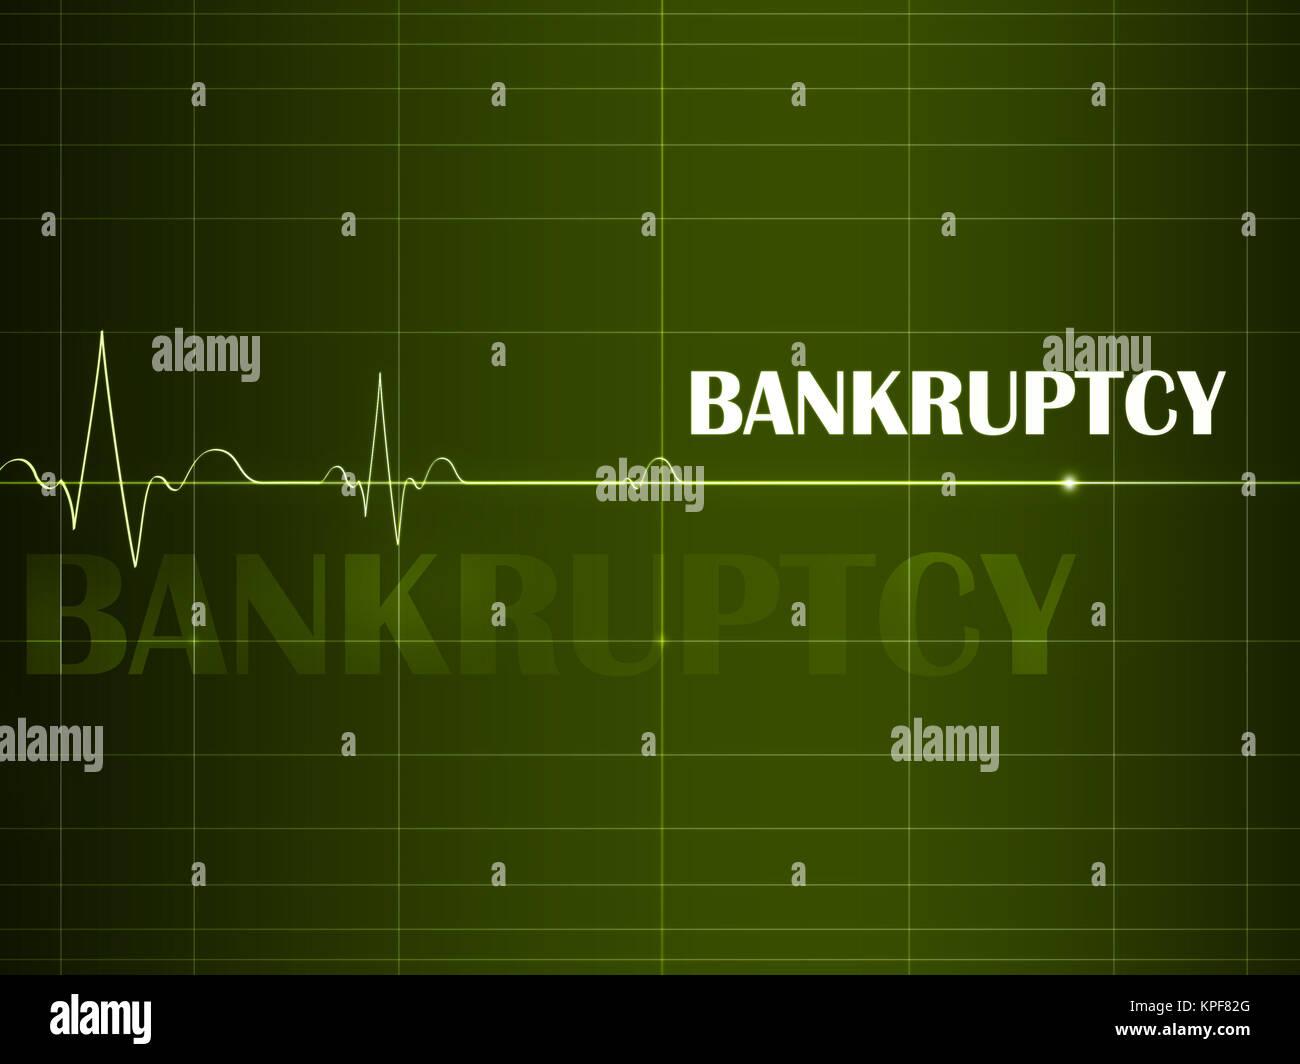 Business artwork - Bankruptcy. Financial Concept. 2D Design. Stock Photo